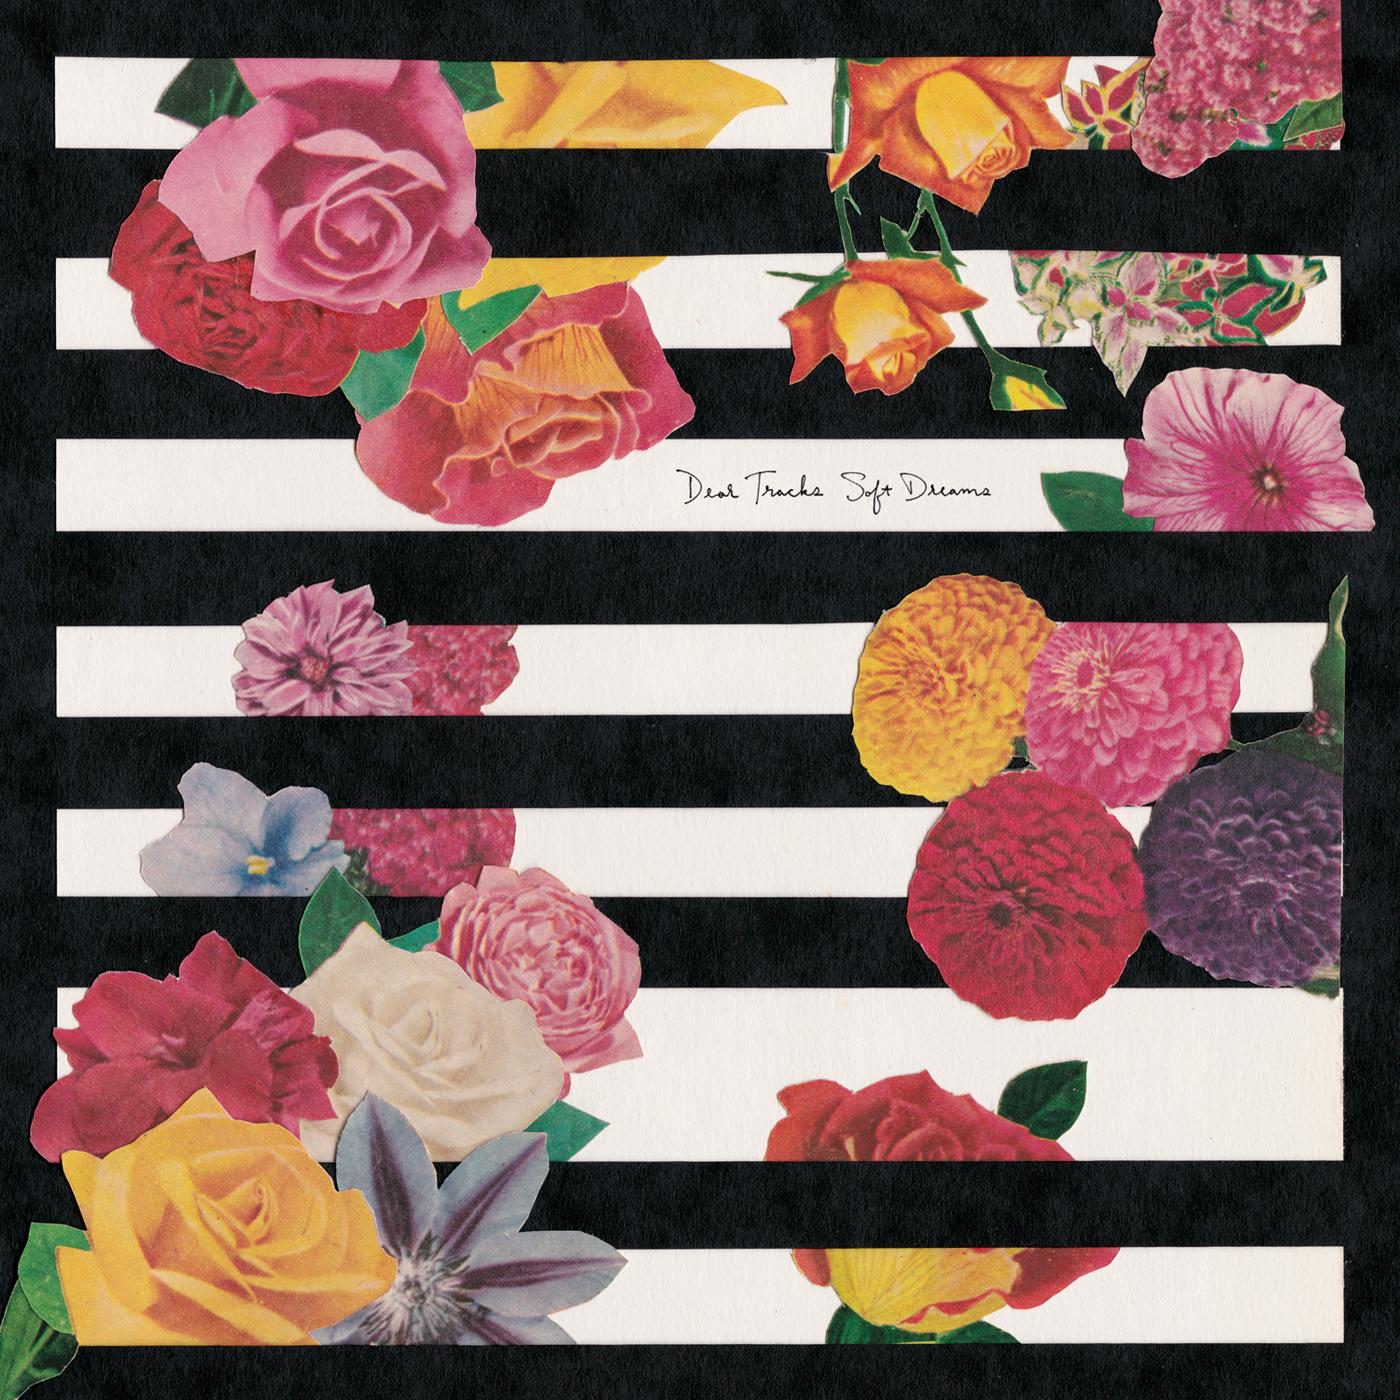 Dear Tracks - Soft Dreams Cover_1400.jpg